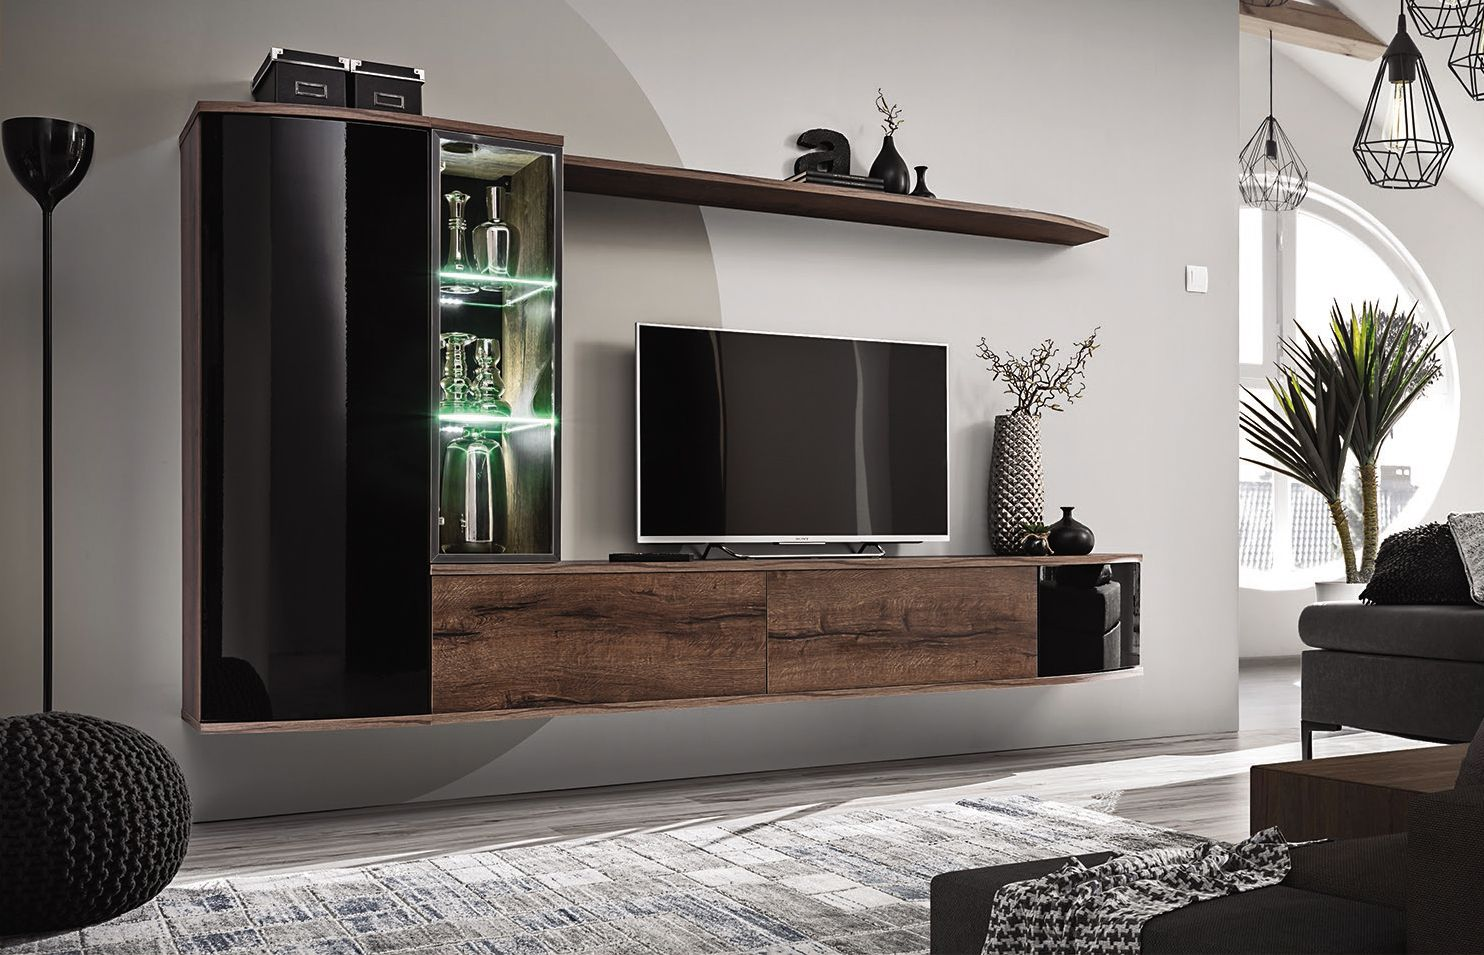 Goedkope Tv Meubels Wand Dressoir Zwevend Tv Zwevende Tv Kast Hoogwaardige Tv Wand In 2021 Living Room Wall Units Modern Tv Wall Units Entertainment Wall Units